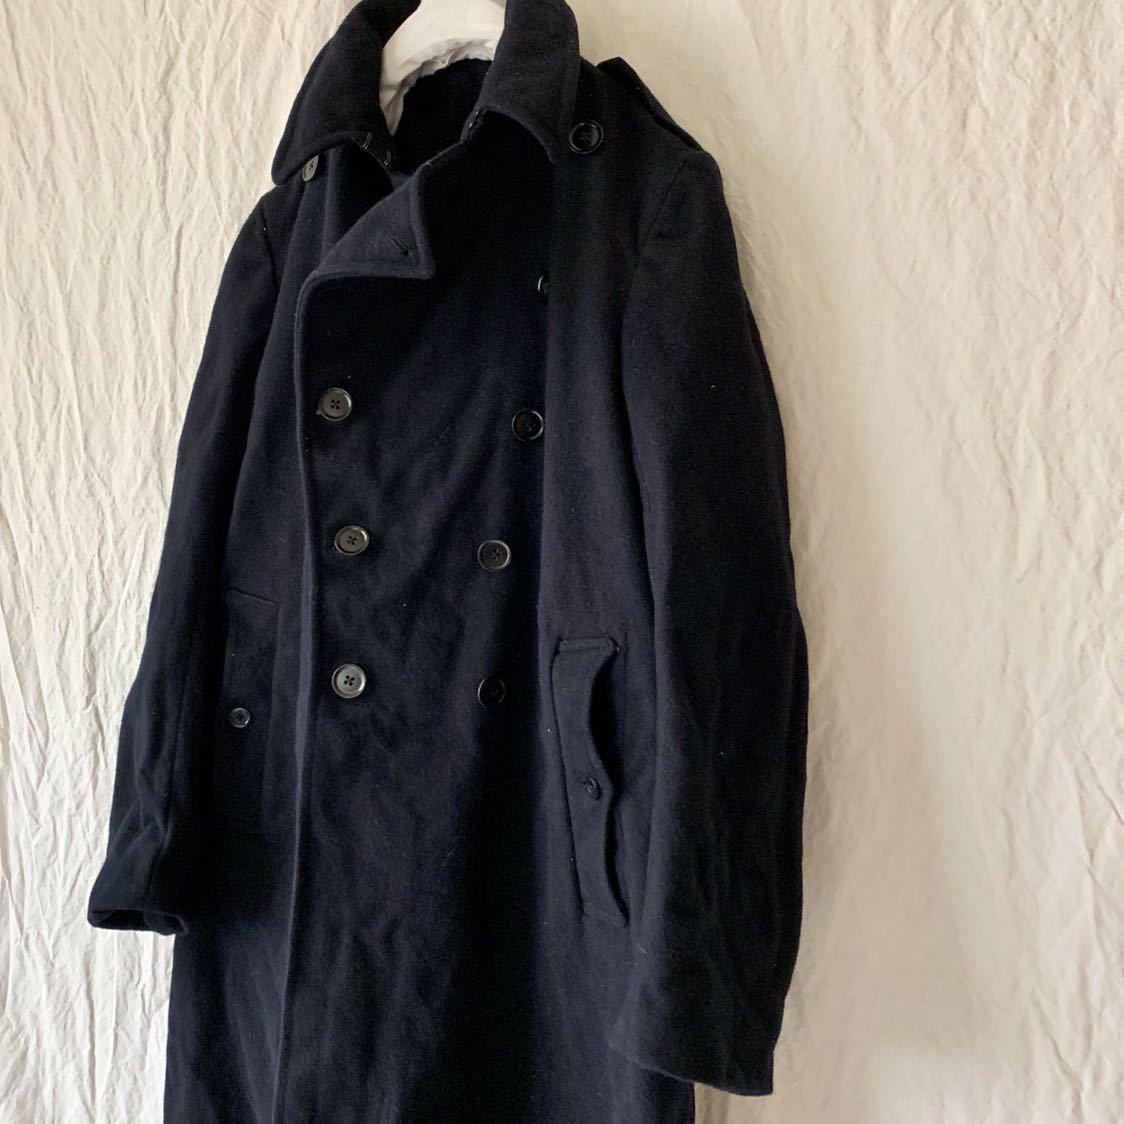 40s 50s イギリス ビンテージ ヘビーメルトン ファイヤーマン コート ウール ワーク 濃紺 ピーコート ダッフル _画像4